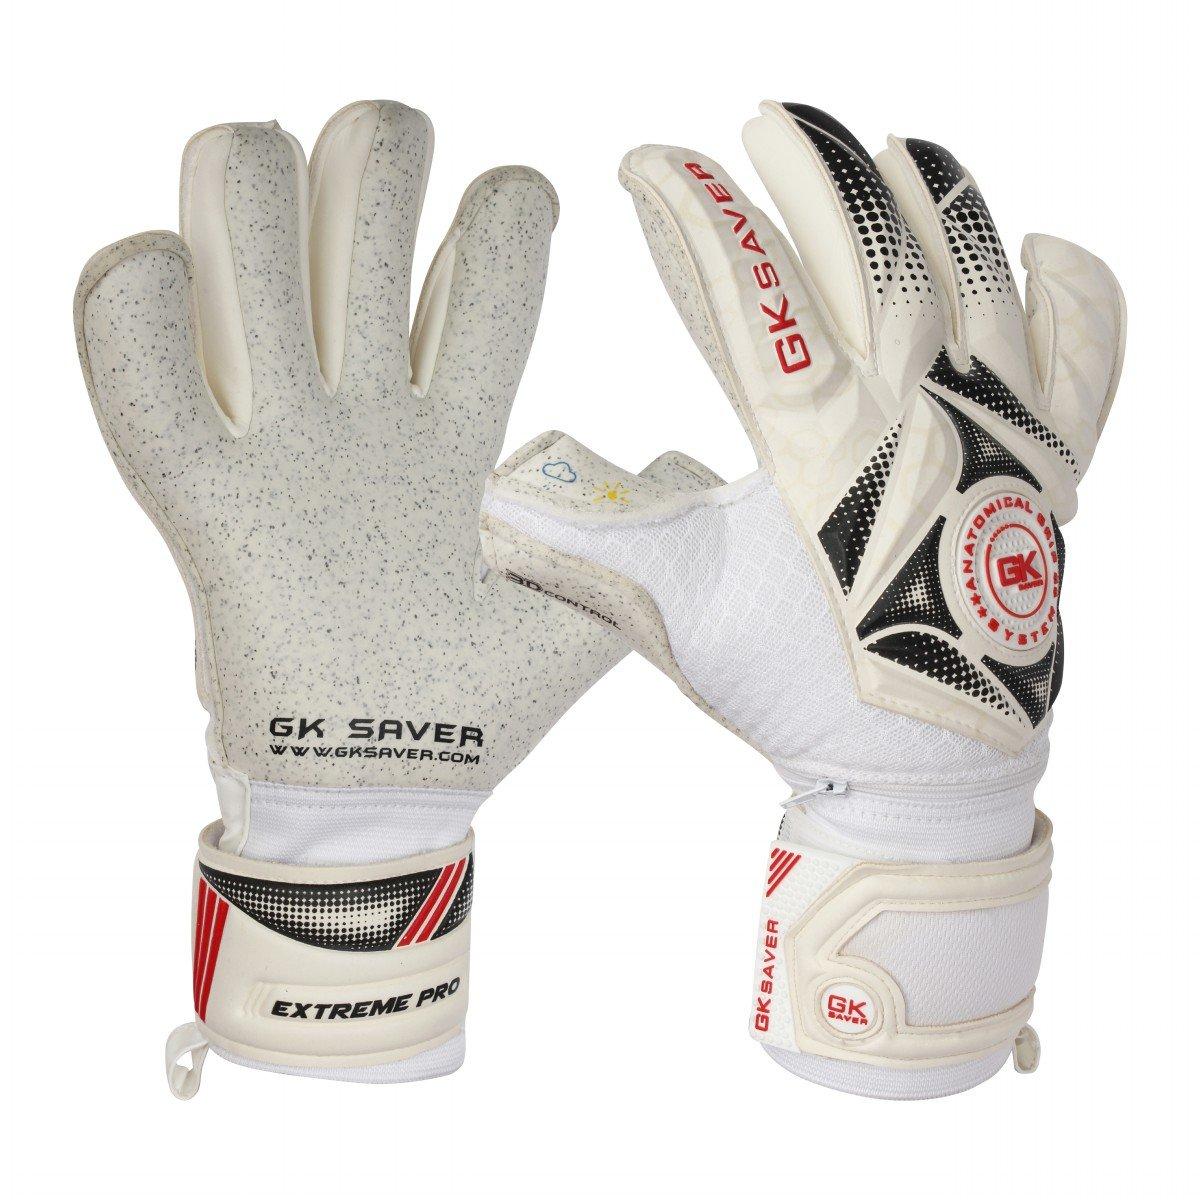 "GK Saver Fußballtorwart-Handschuhe ""3D Winner 04 Quarz Hybrid , professionelle hochwertige Handschuhe"